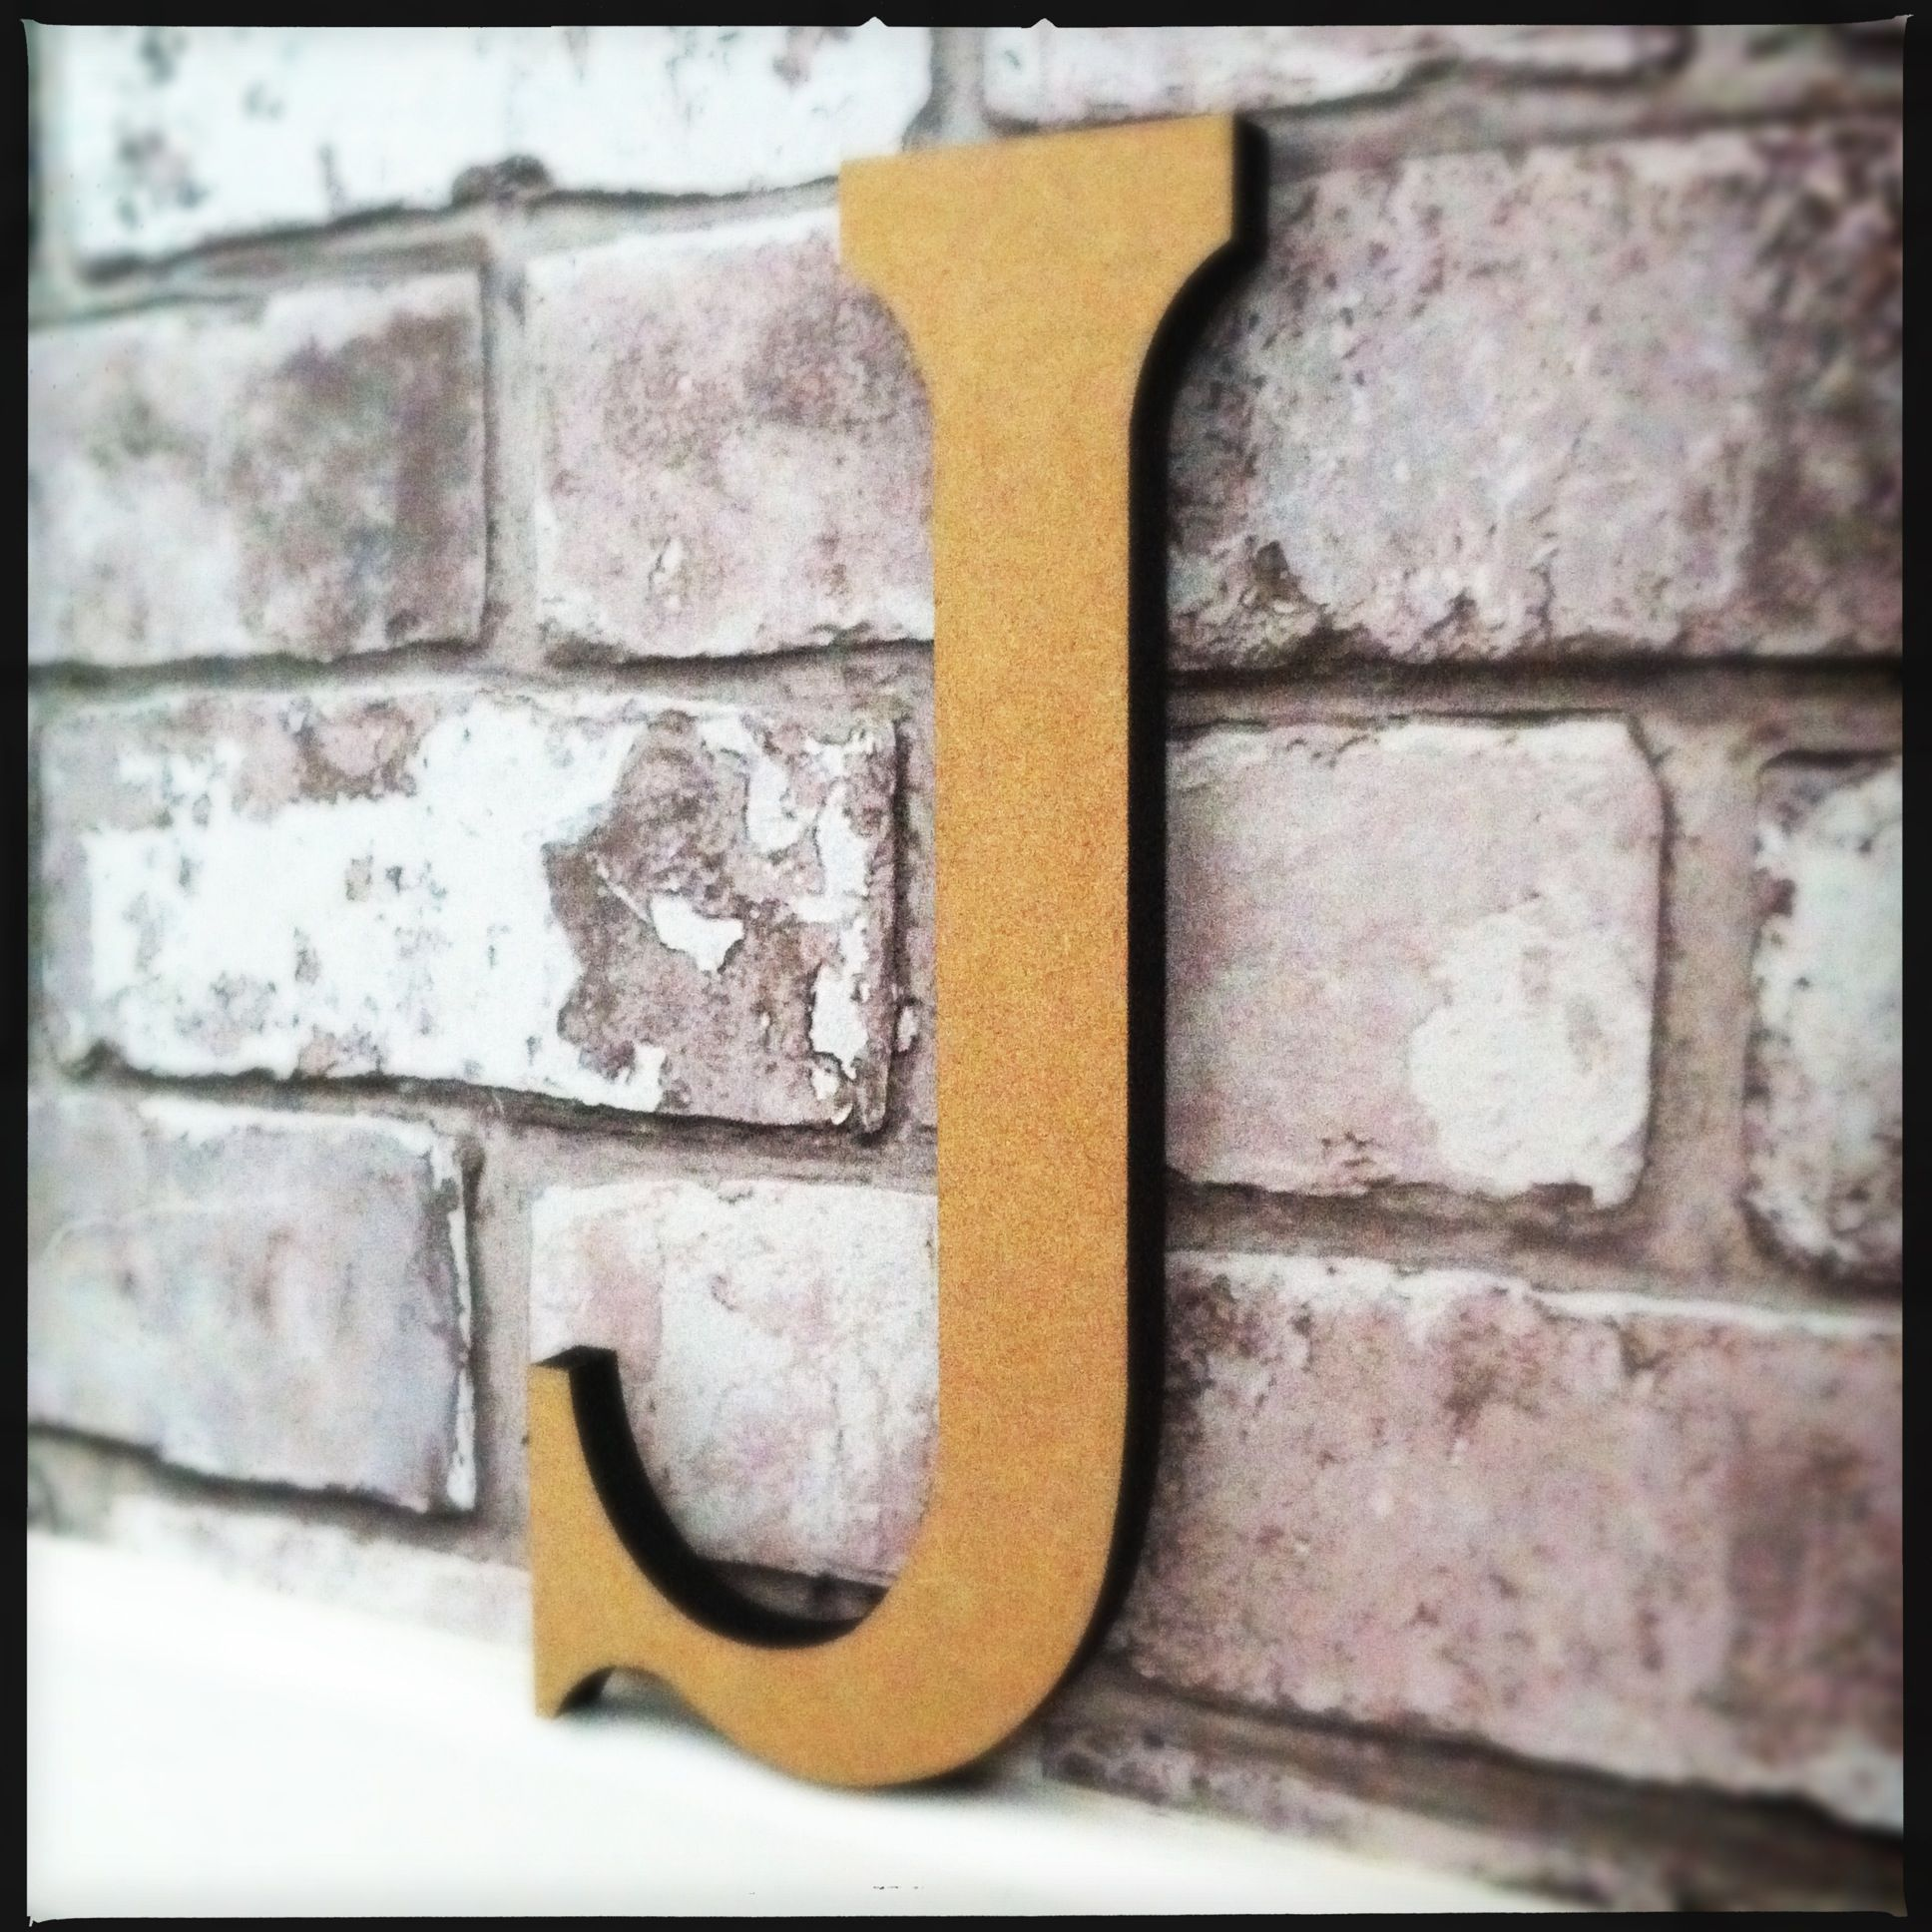 Letter J  In my case for Jesus.  Or for John, Jeanne, Jennifer or Jerry.